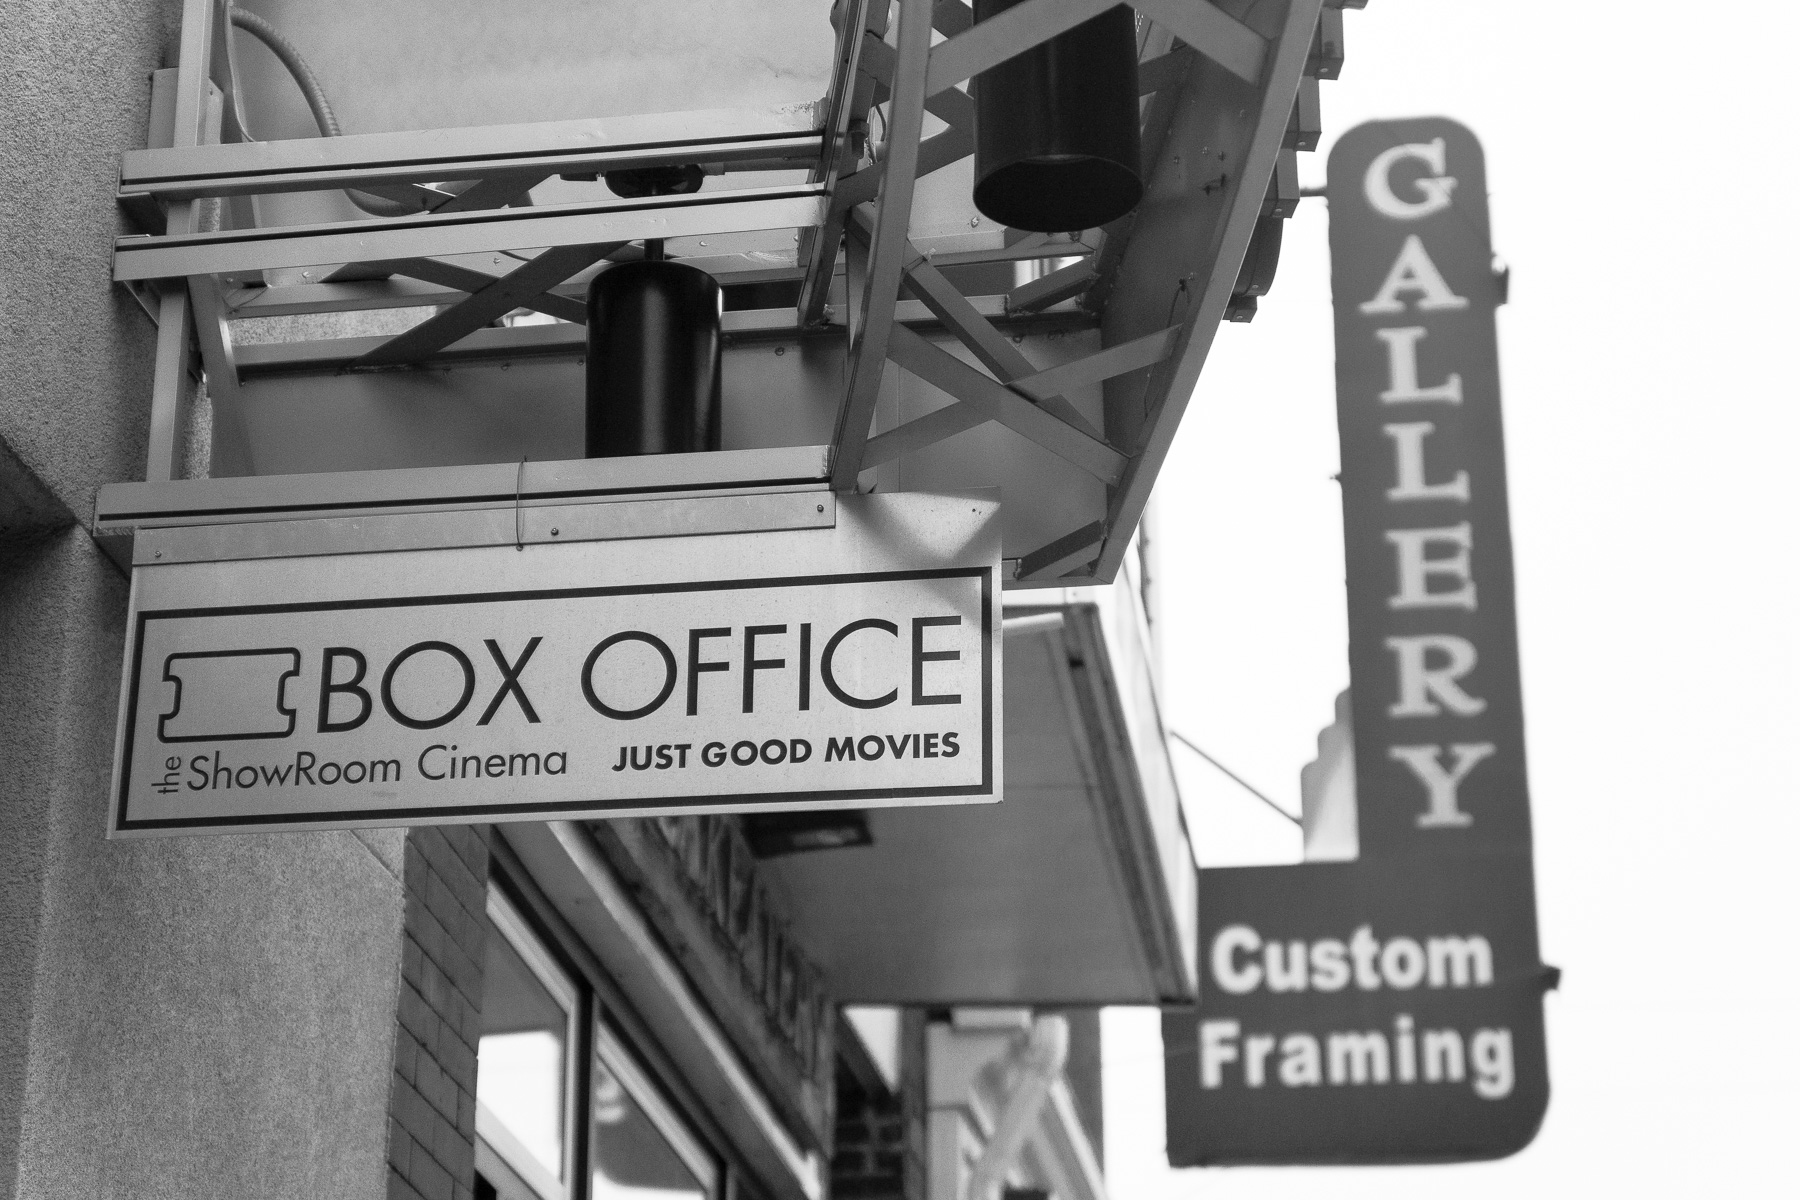 Box Office Asbury Park